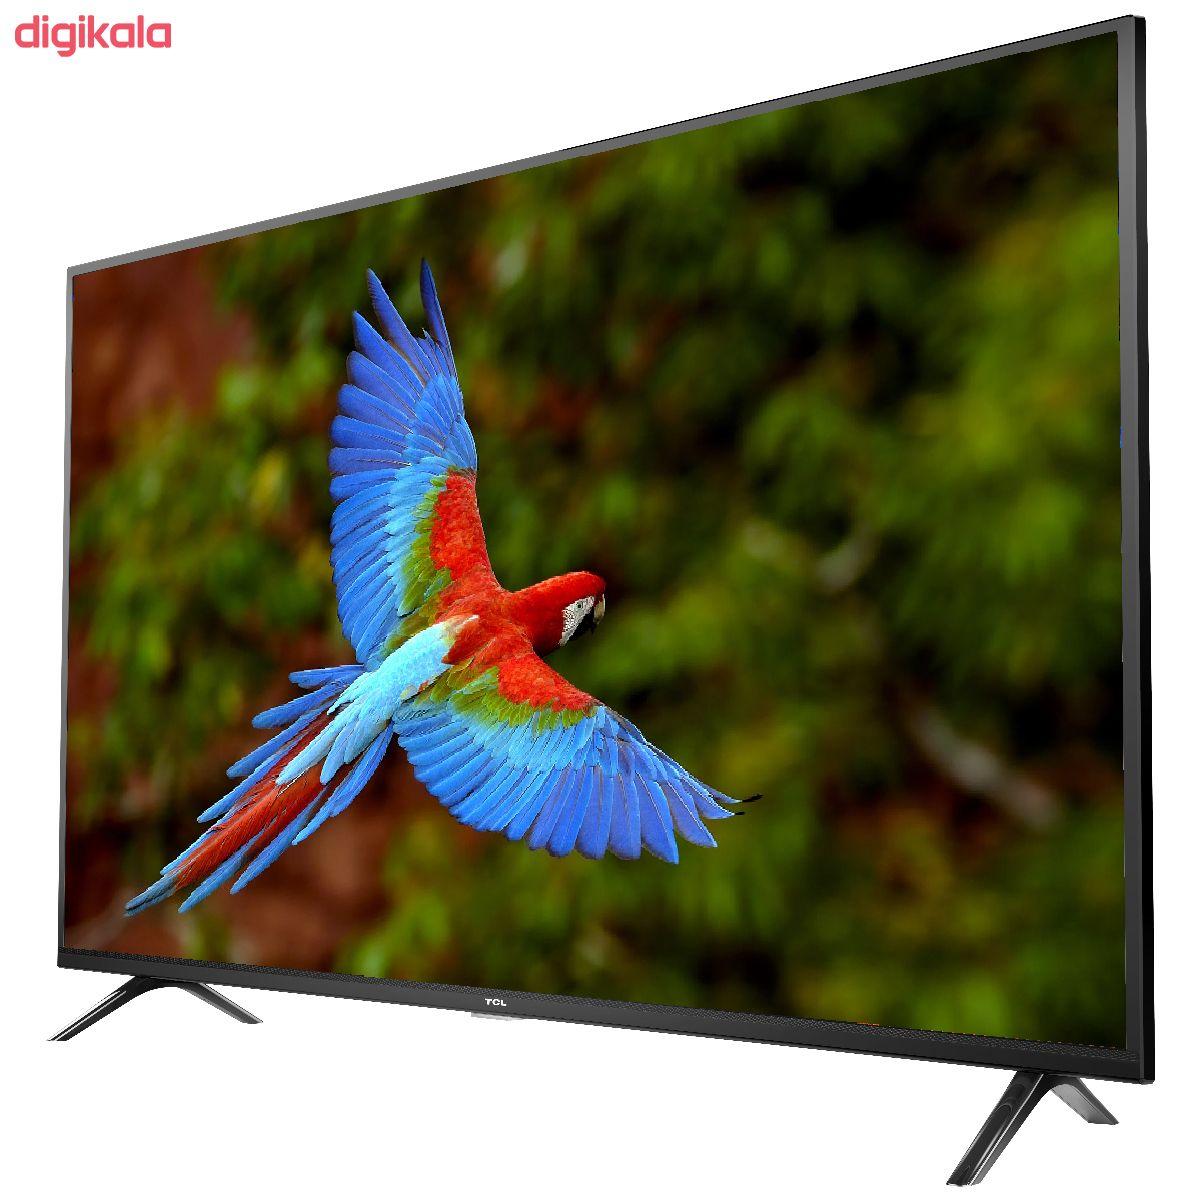 تلویزیون ال ای دی تی سی ال مدل 43D3000i سایز 43 اینچ main 1 3